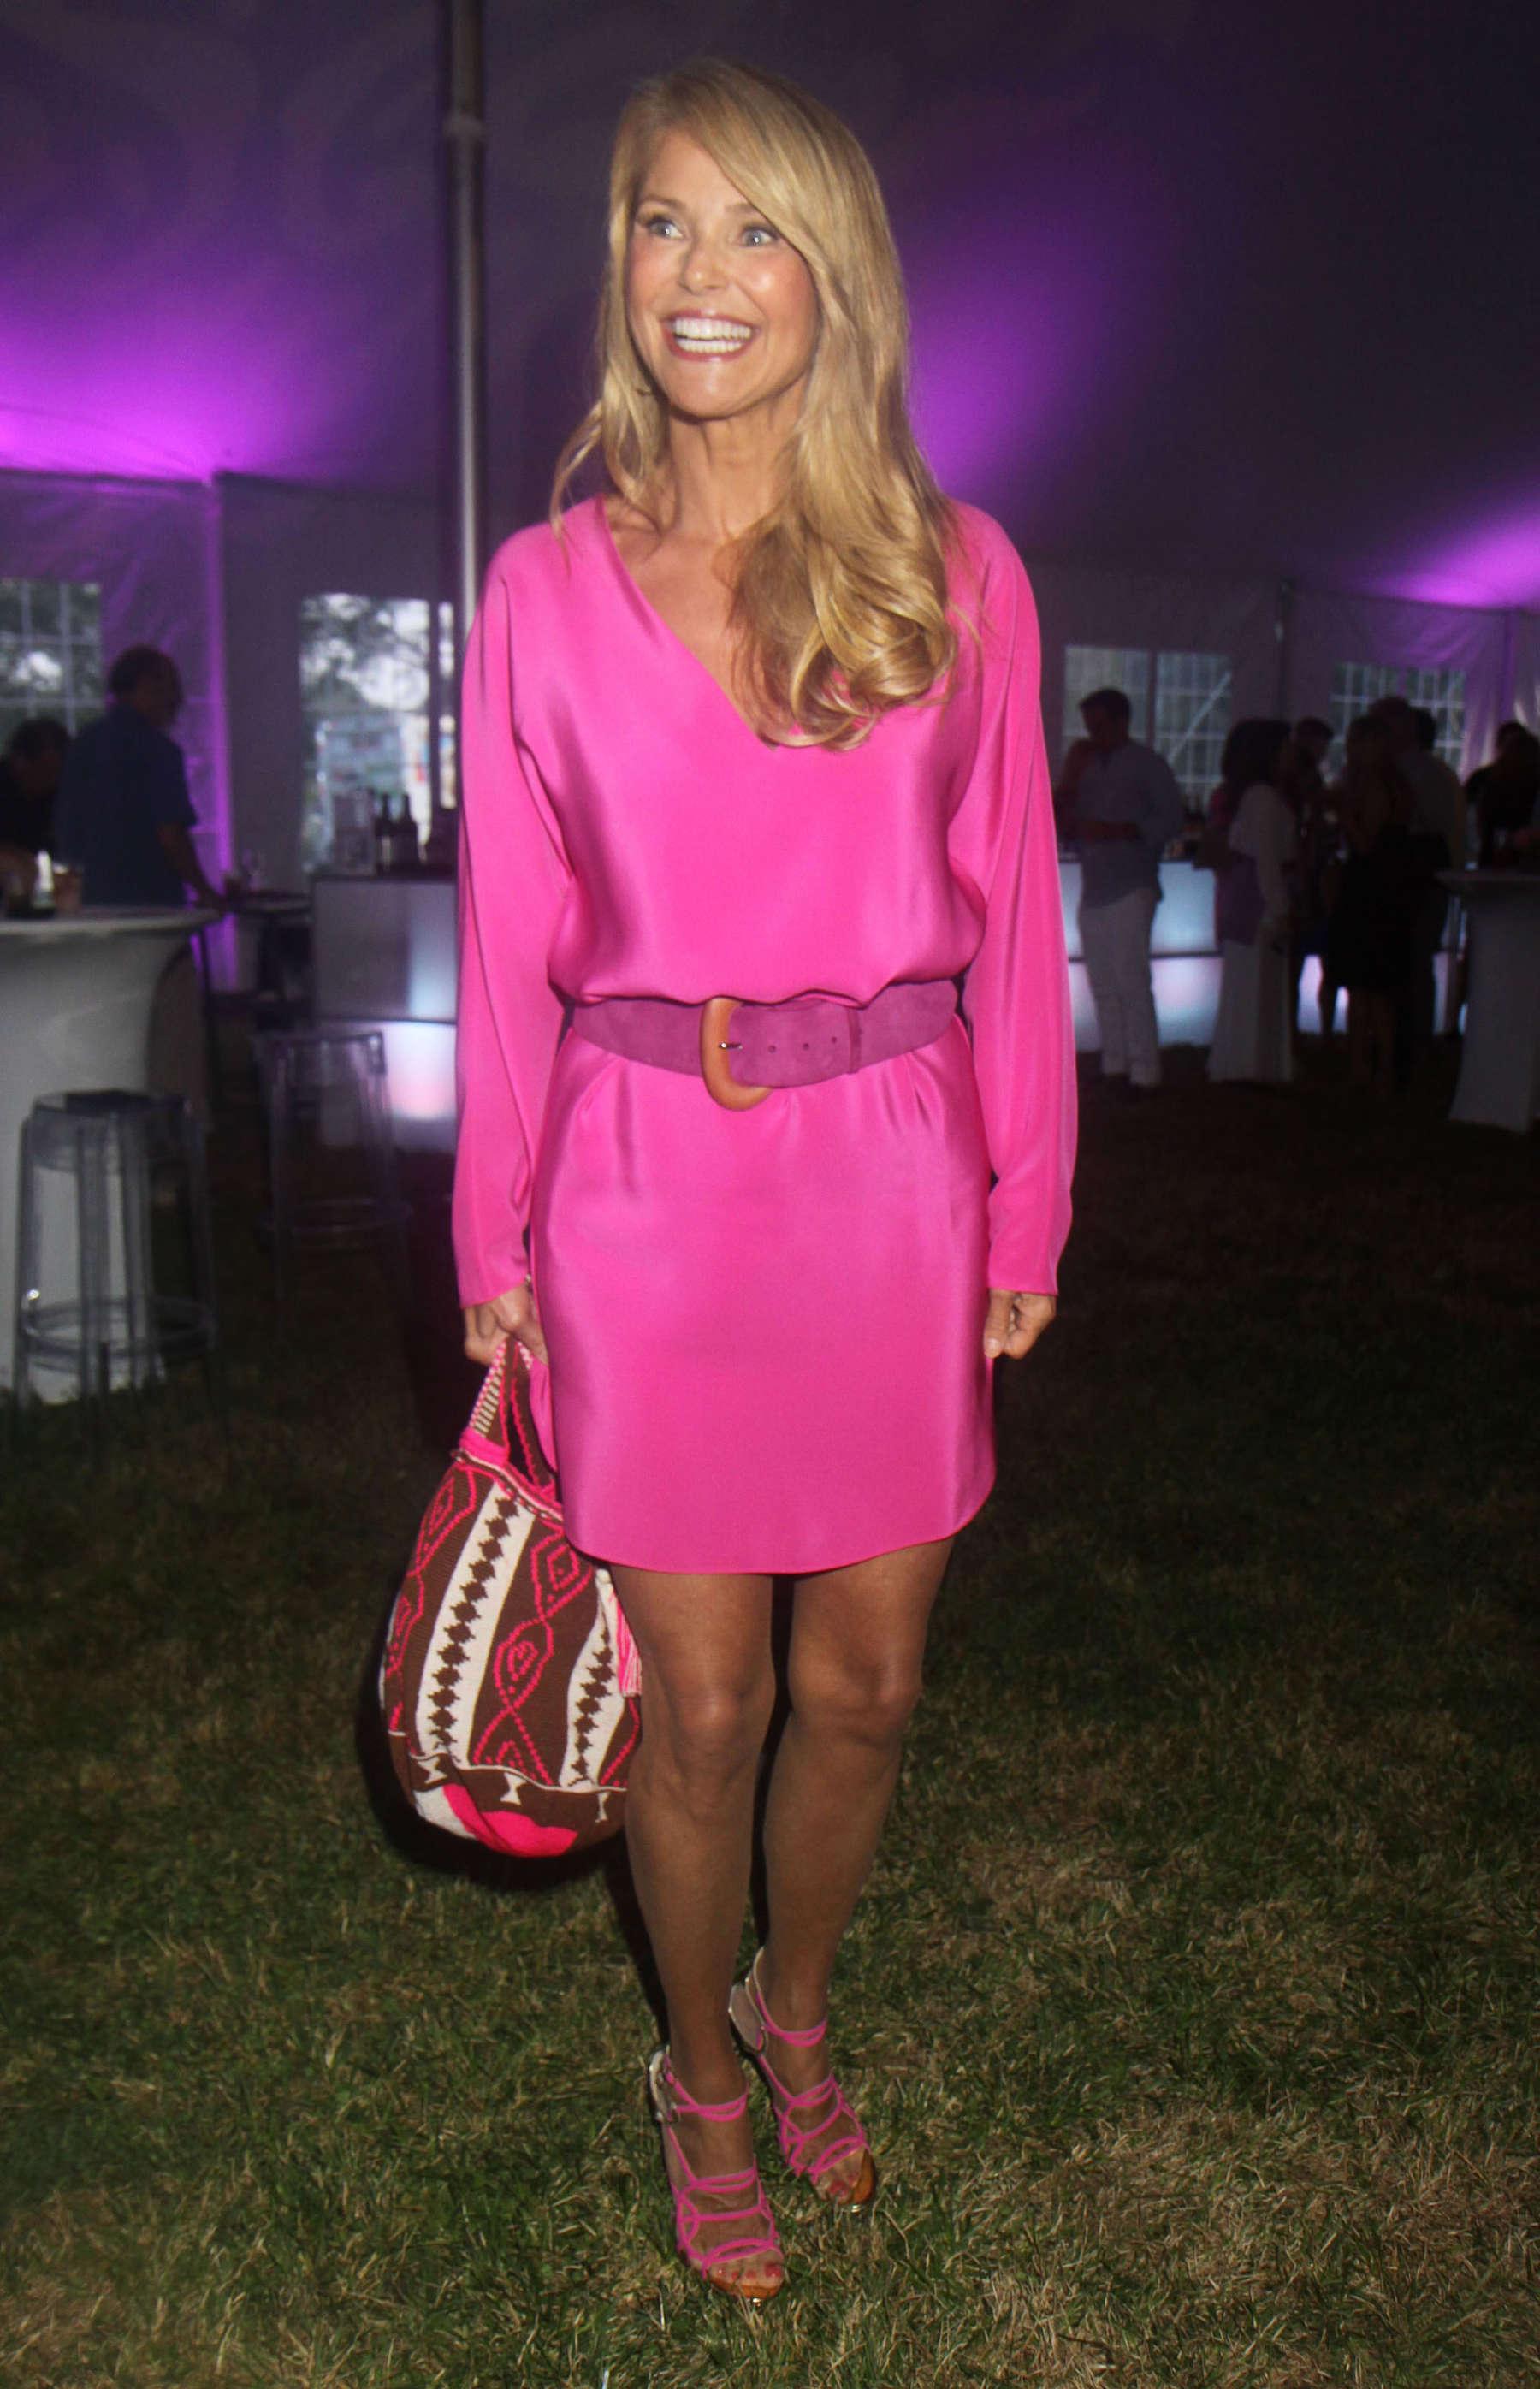 Christie Brinkley 2013 Ellens Run Pink Apron Party 10